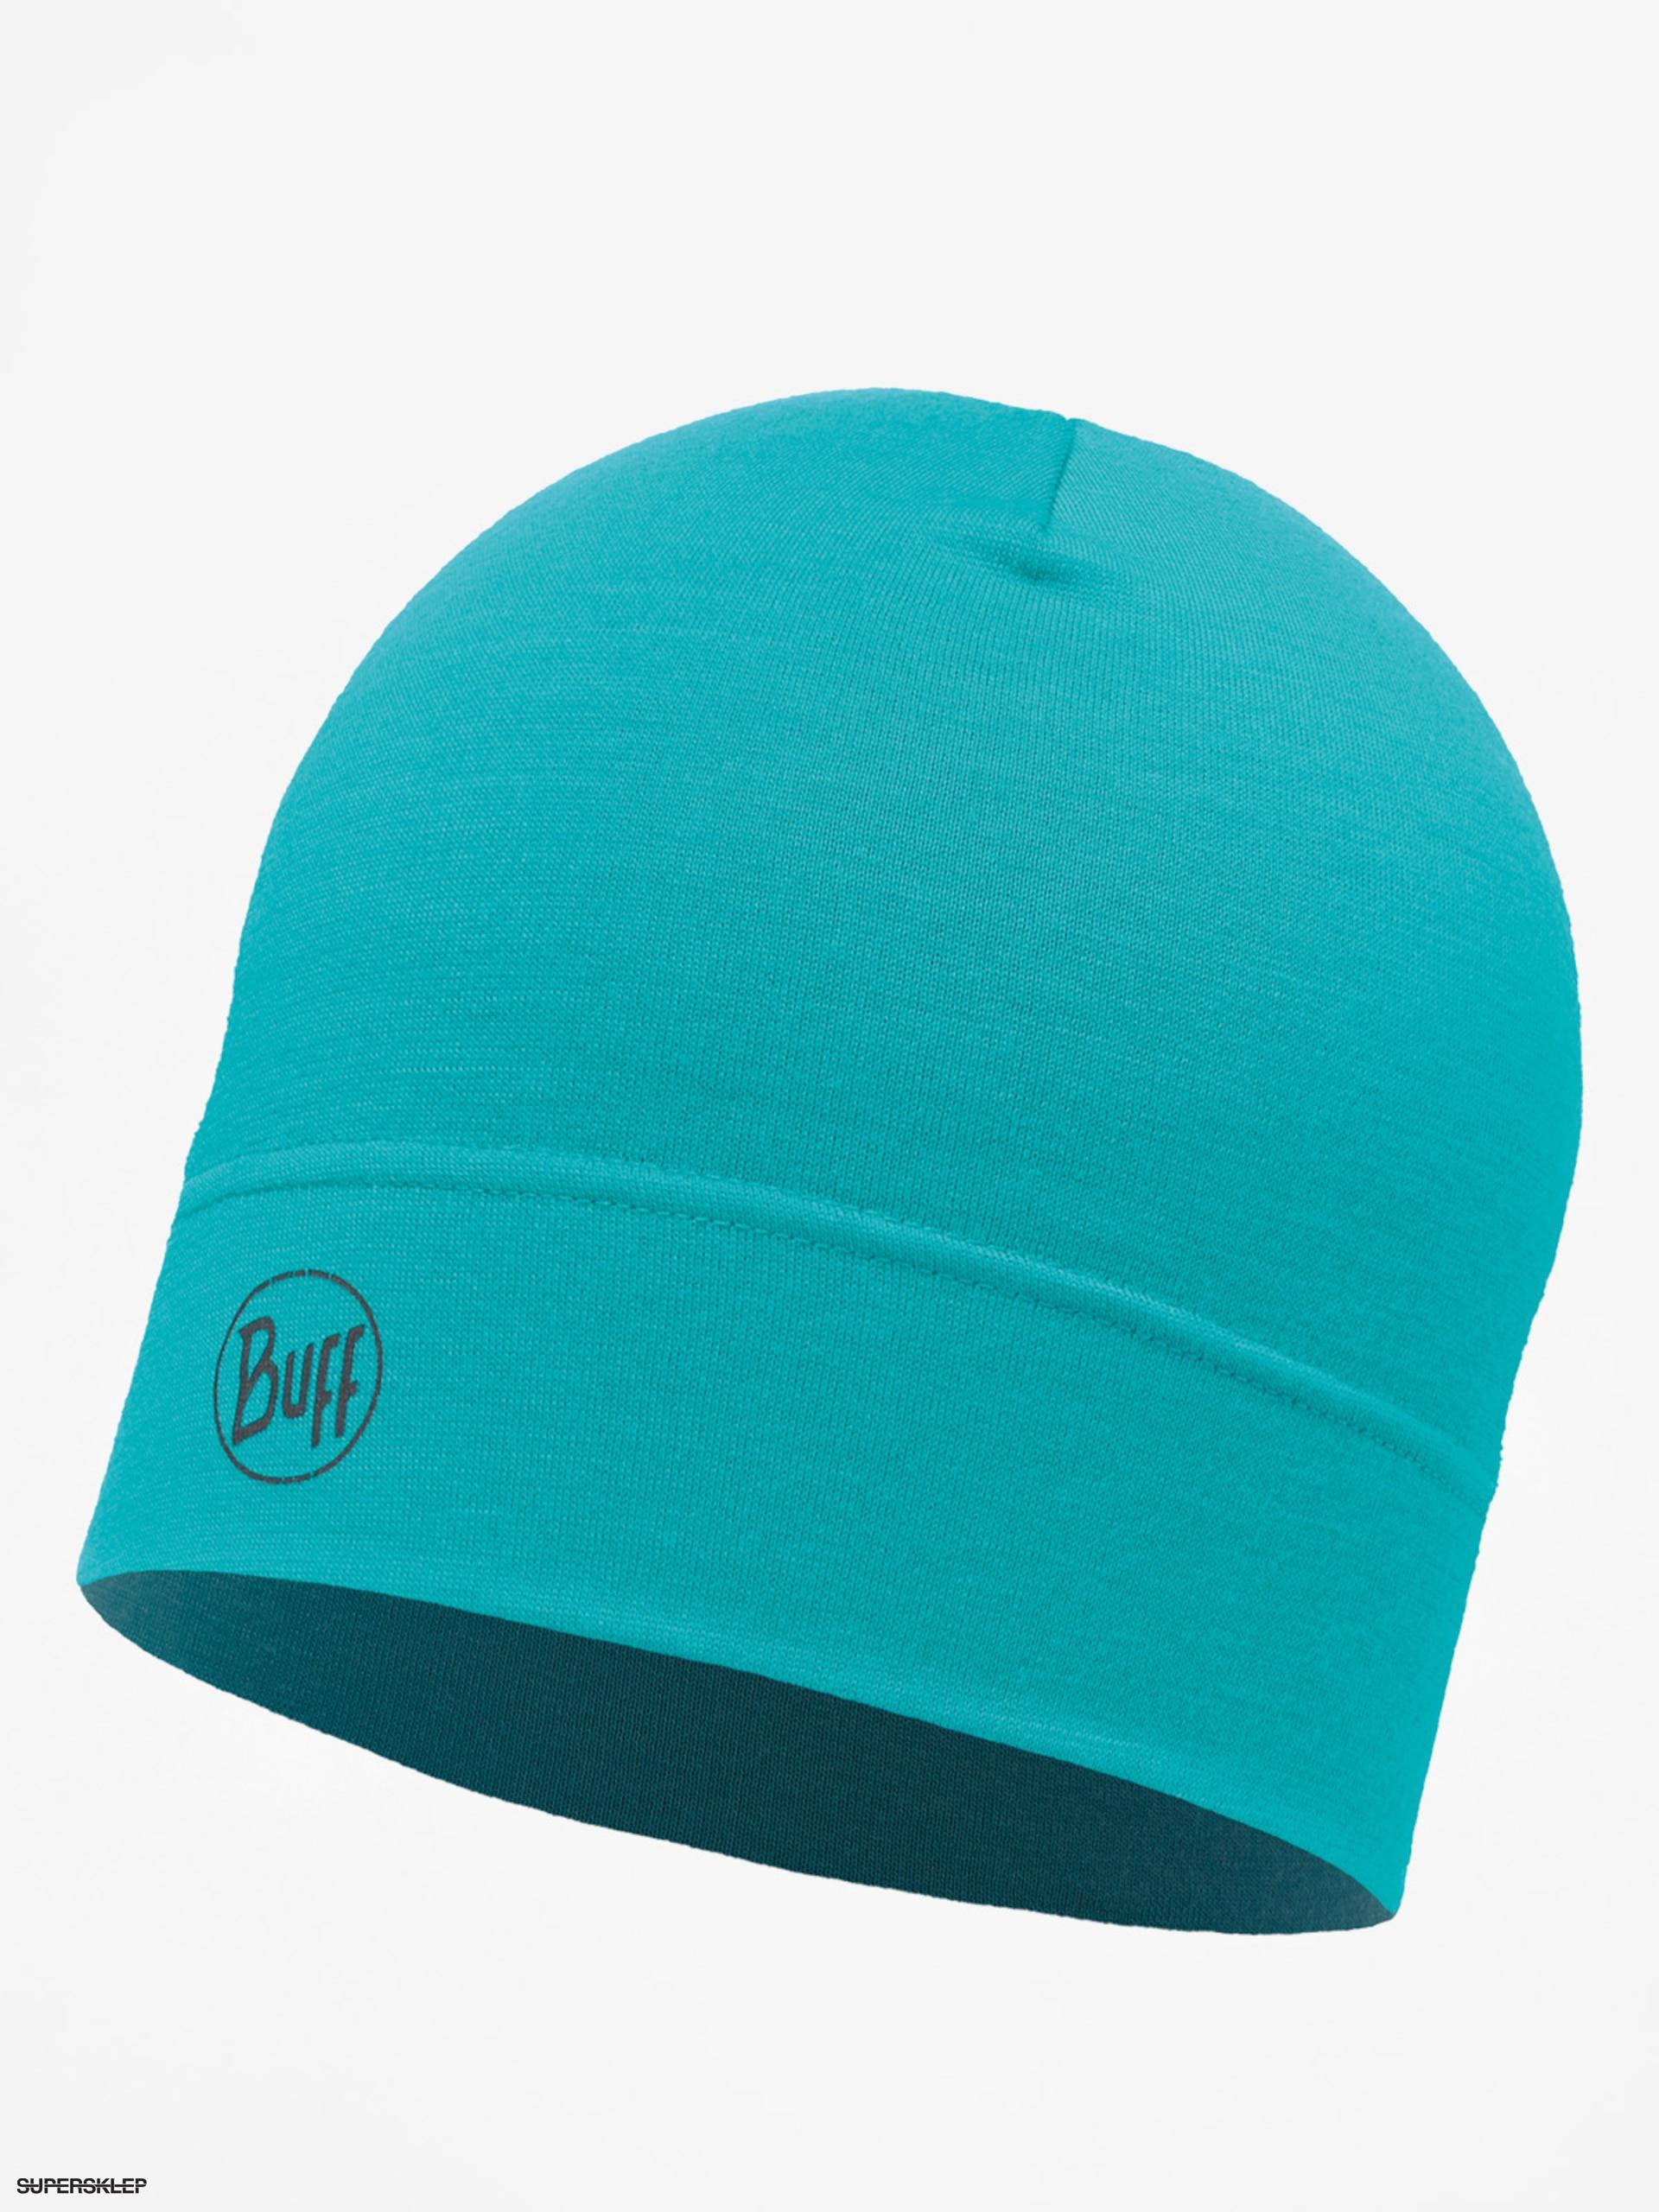 Czapka zimowa Buff Midweight Merino Wool (solid turquoise)